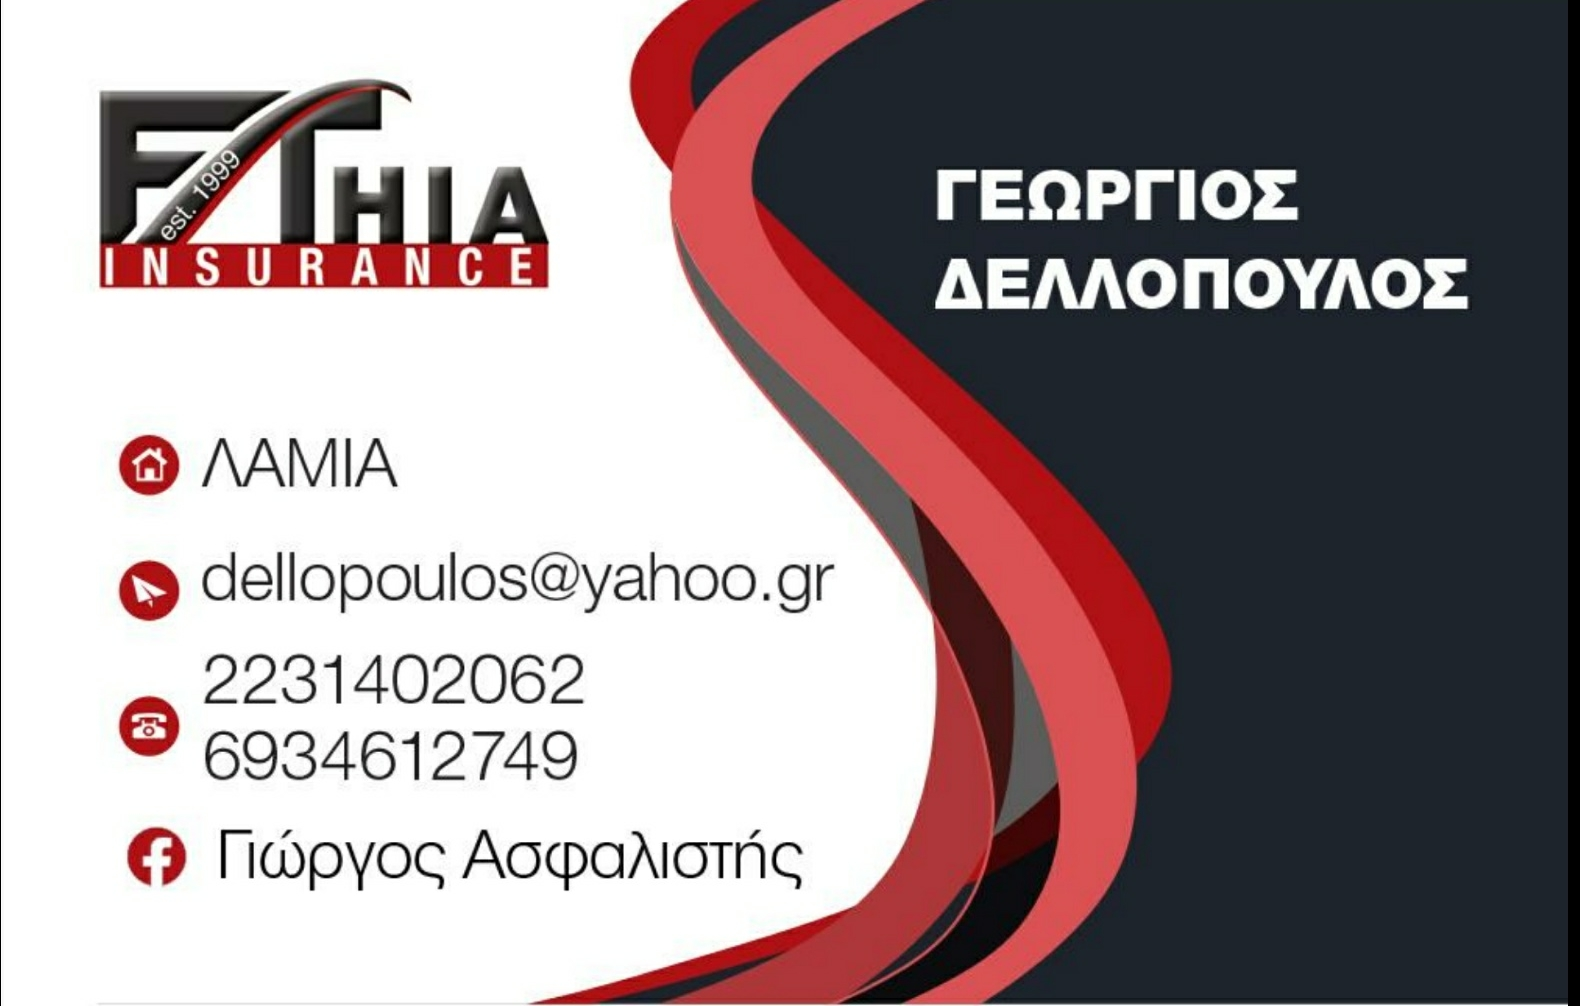 Fthia Insurance - Ασφάλειες Φθιώτιδας